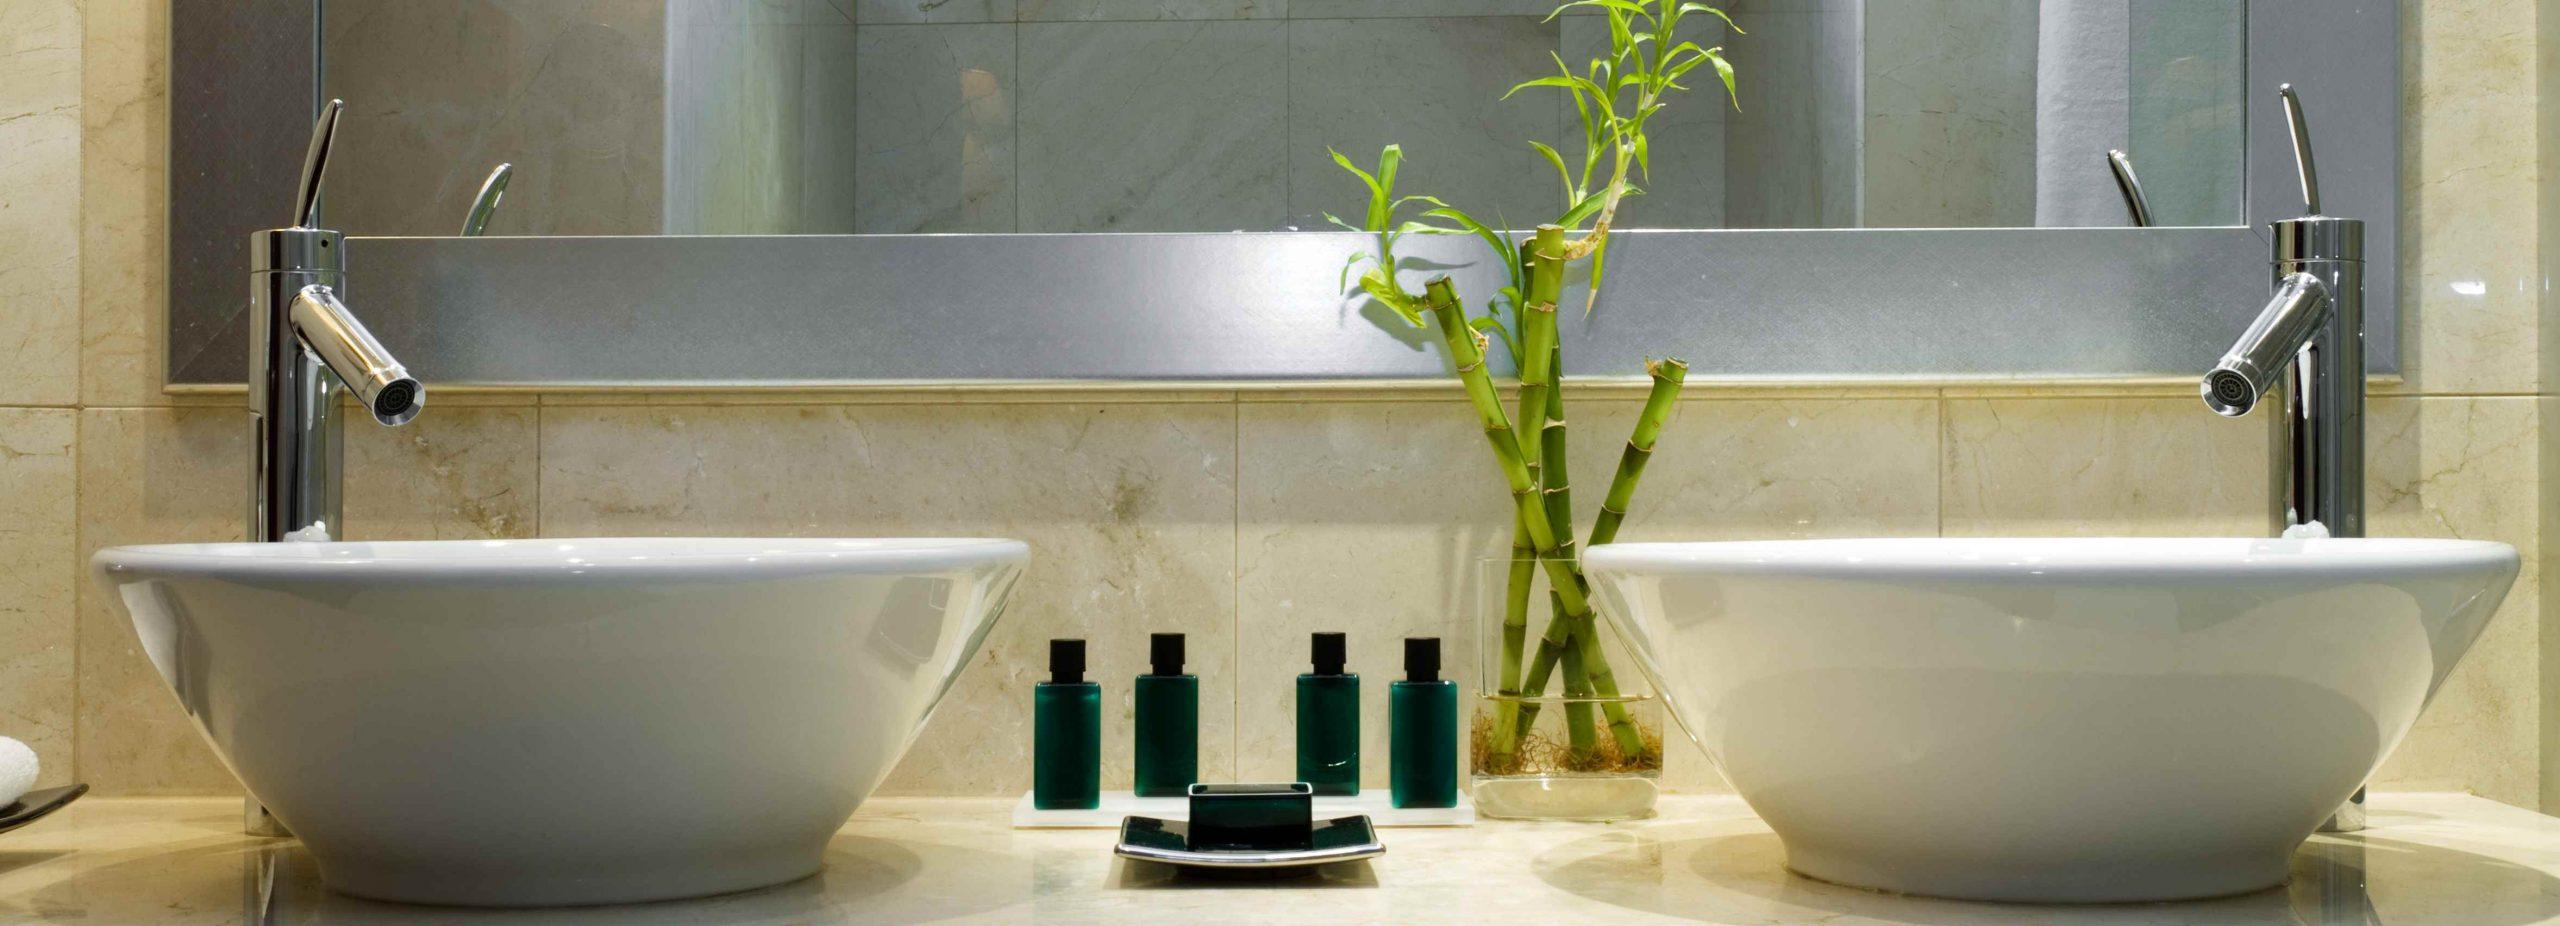 Bathroom Renovations Coogee